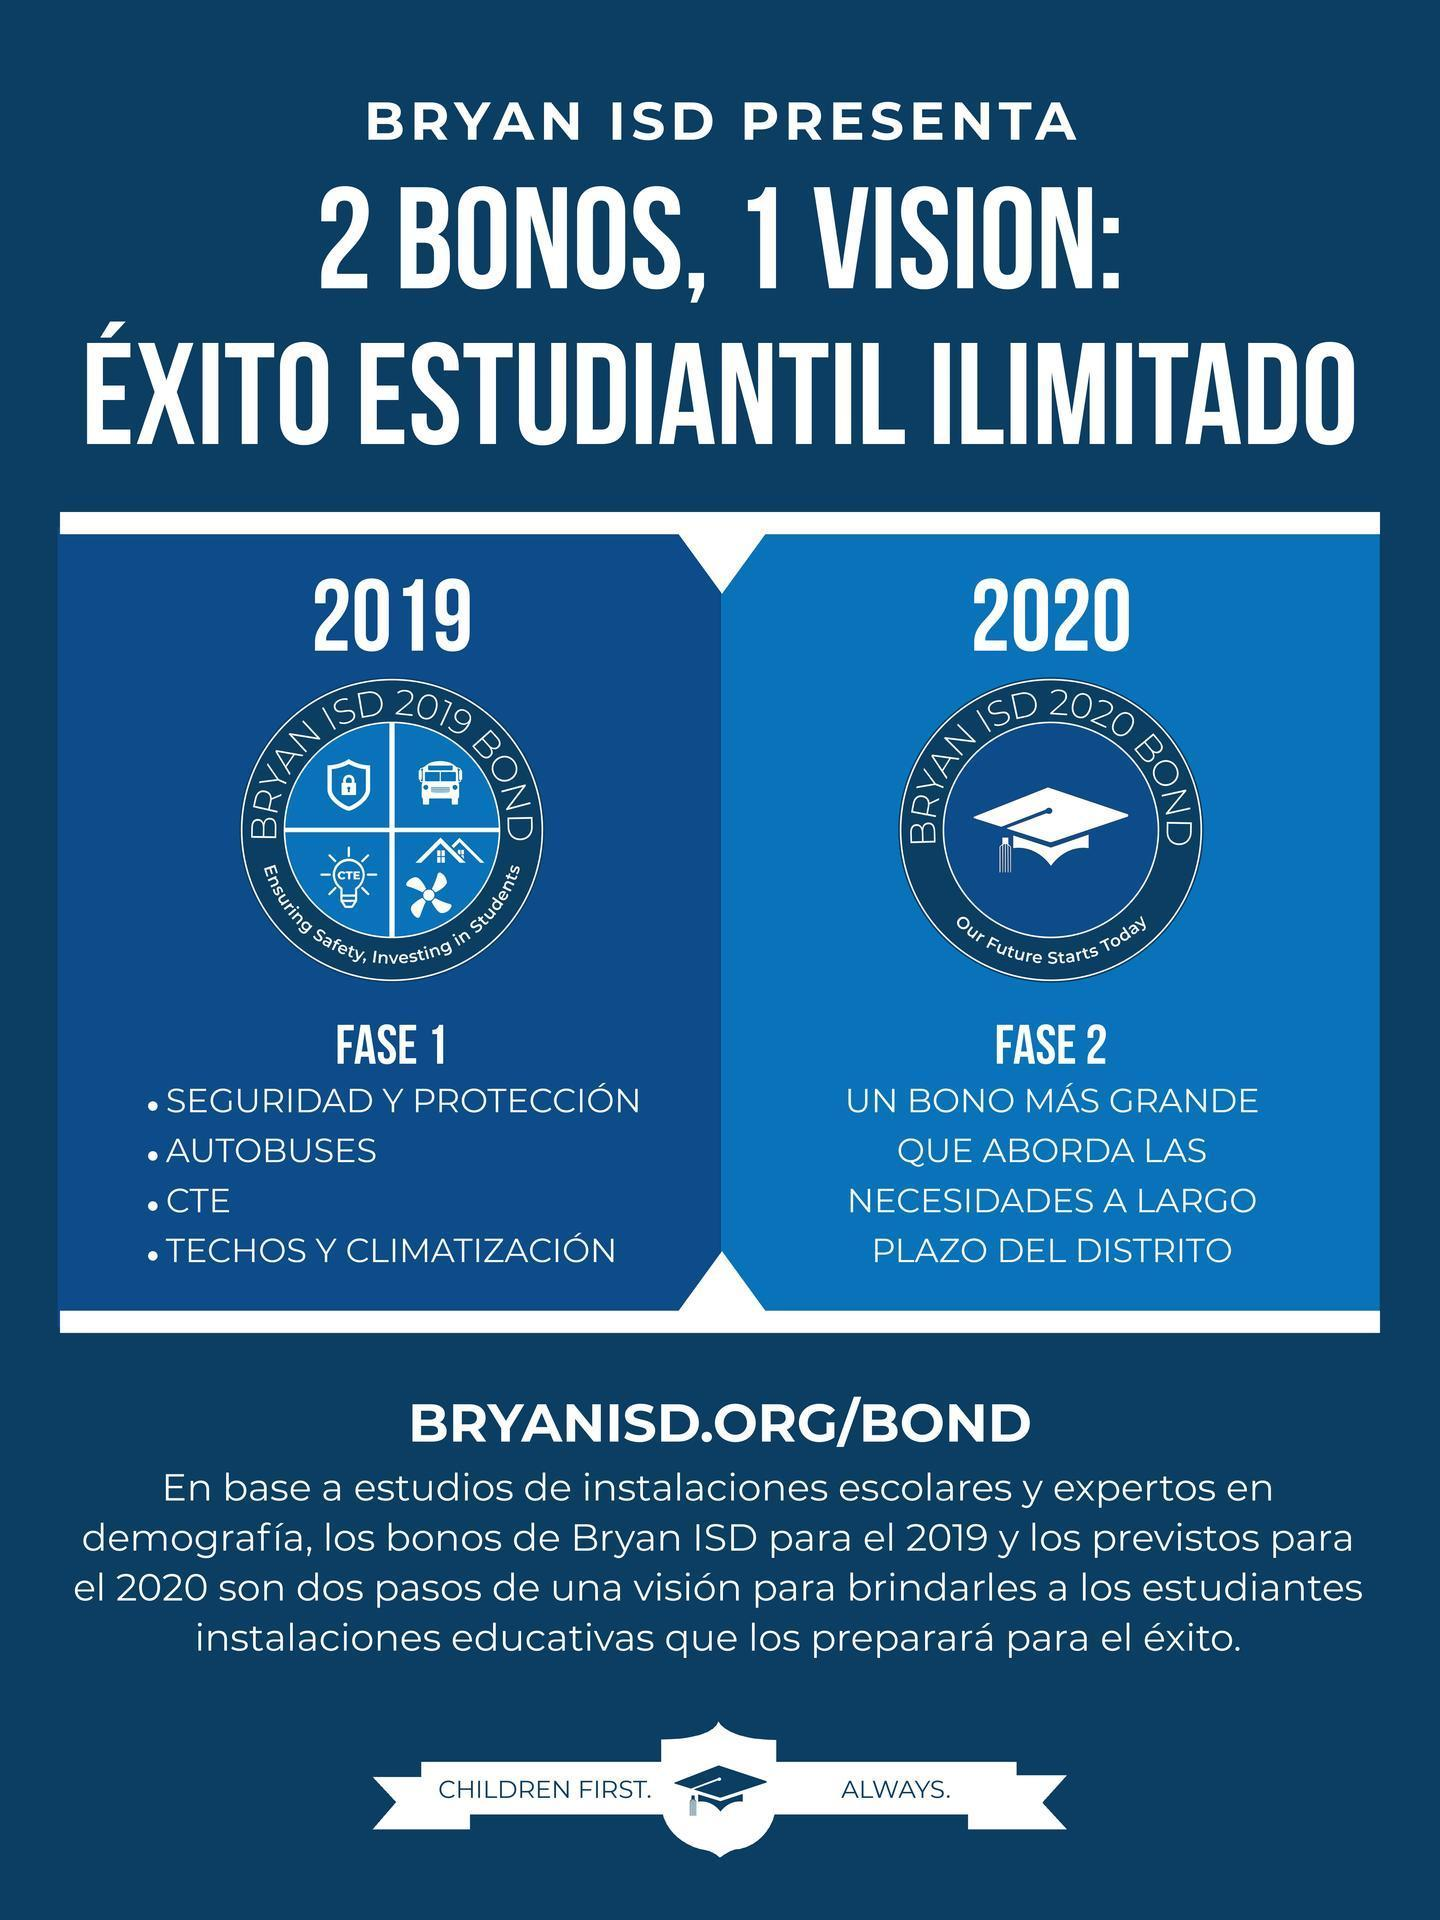 Bryan ISD 2 Bond Plan en Espanol